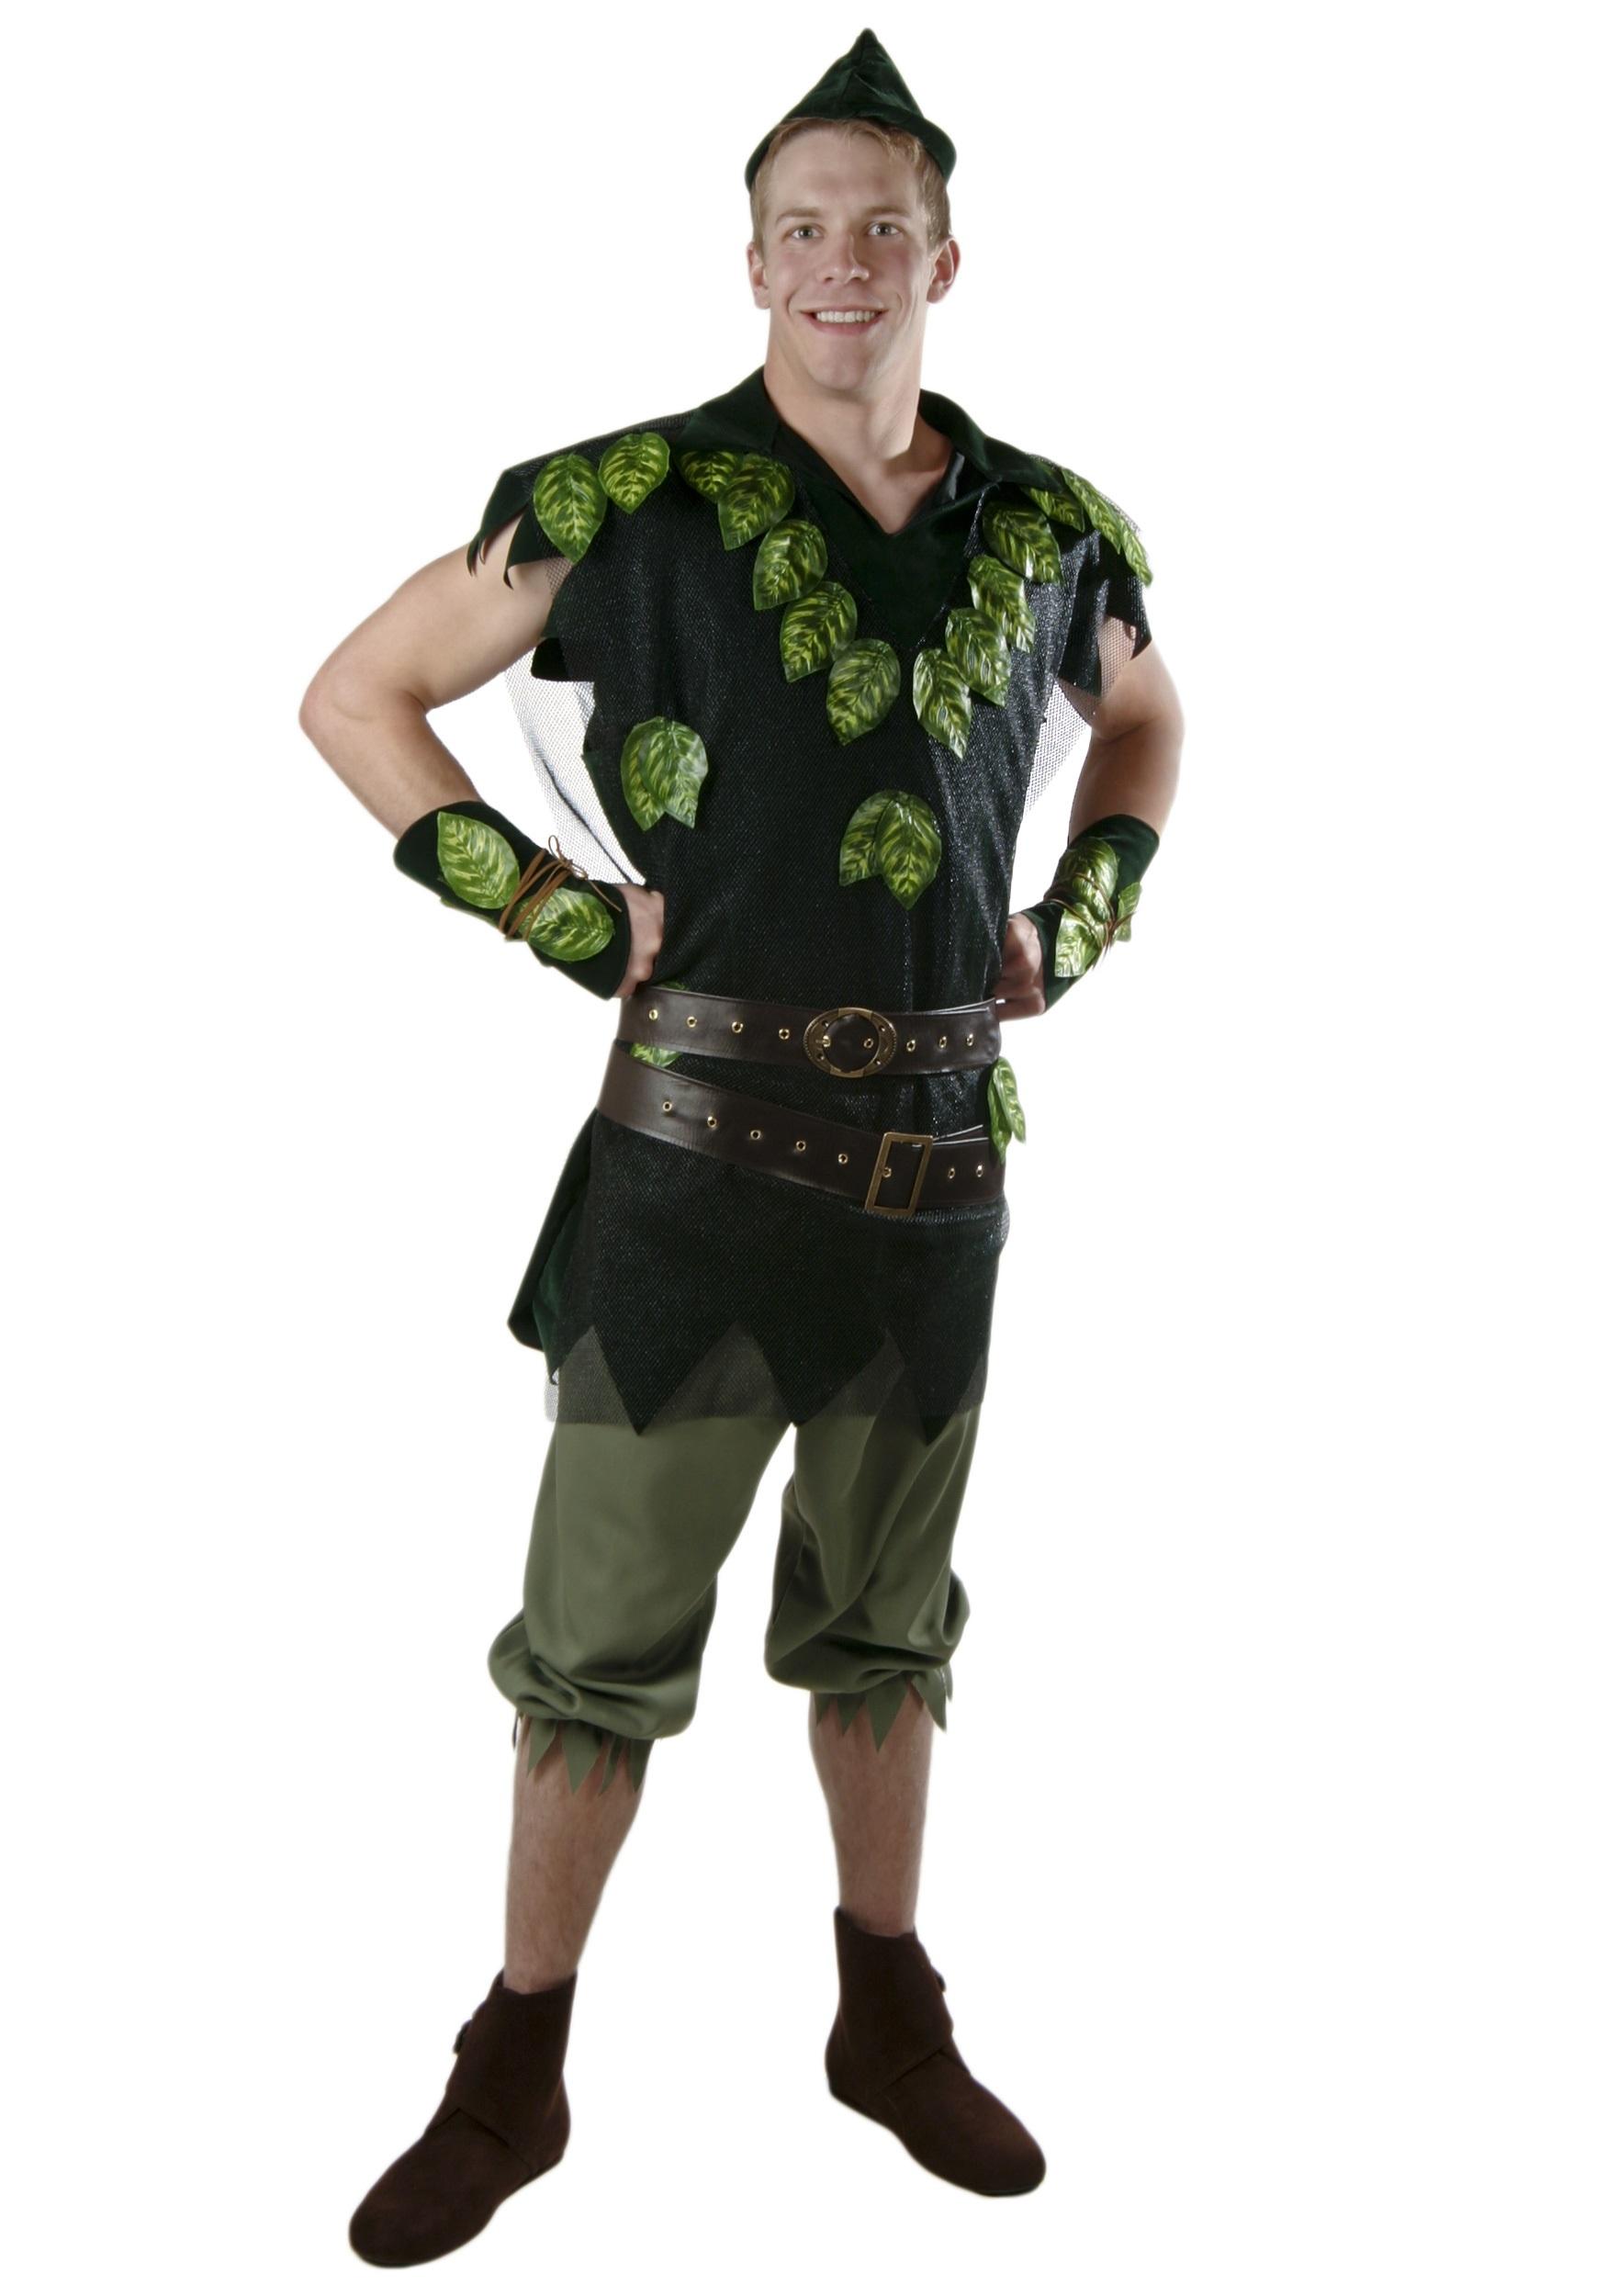 Deluxe Adult Peter Pan Costume Disney Peter Pan Costumes